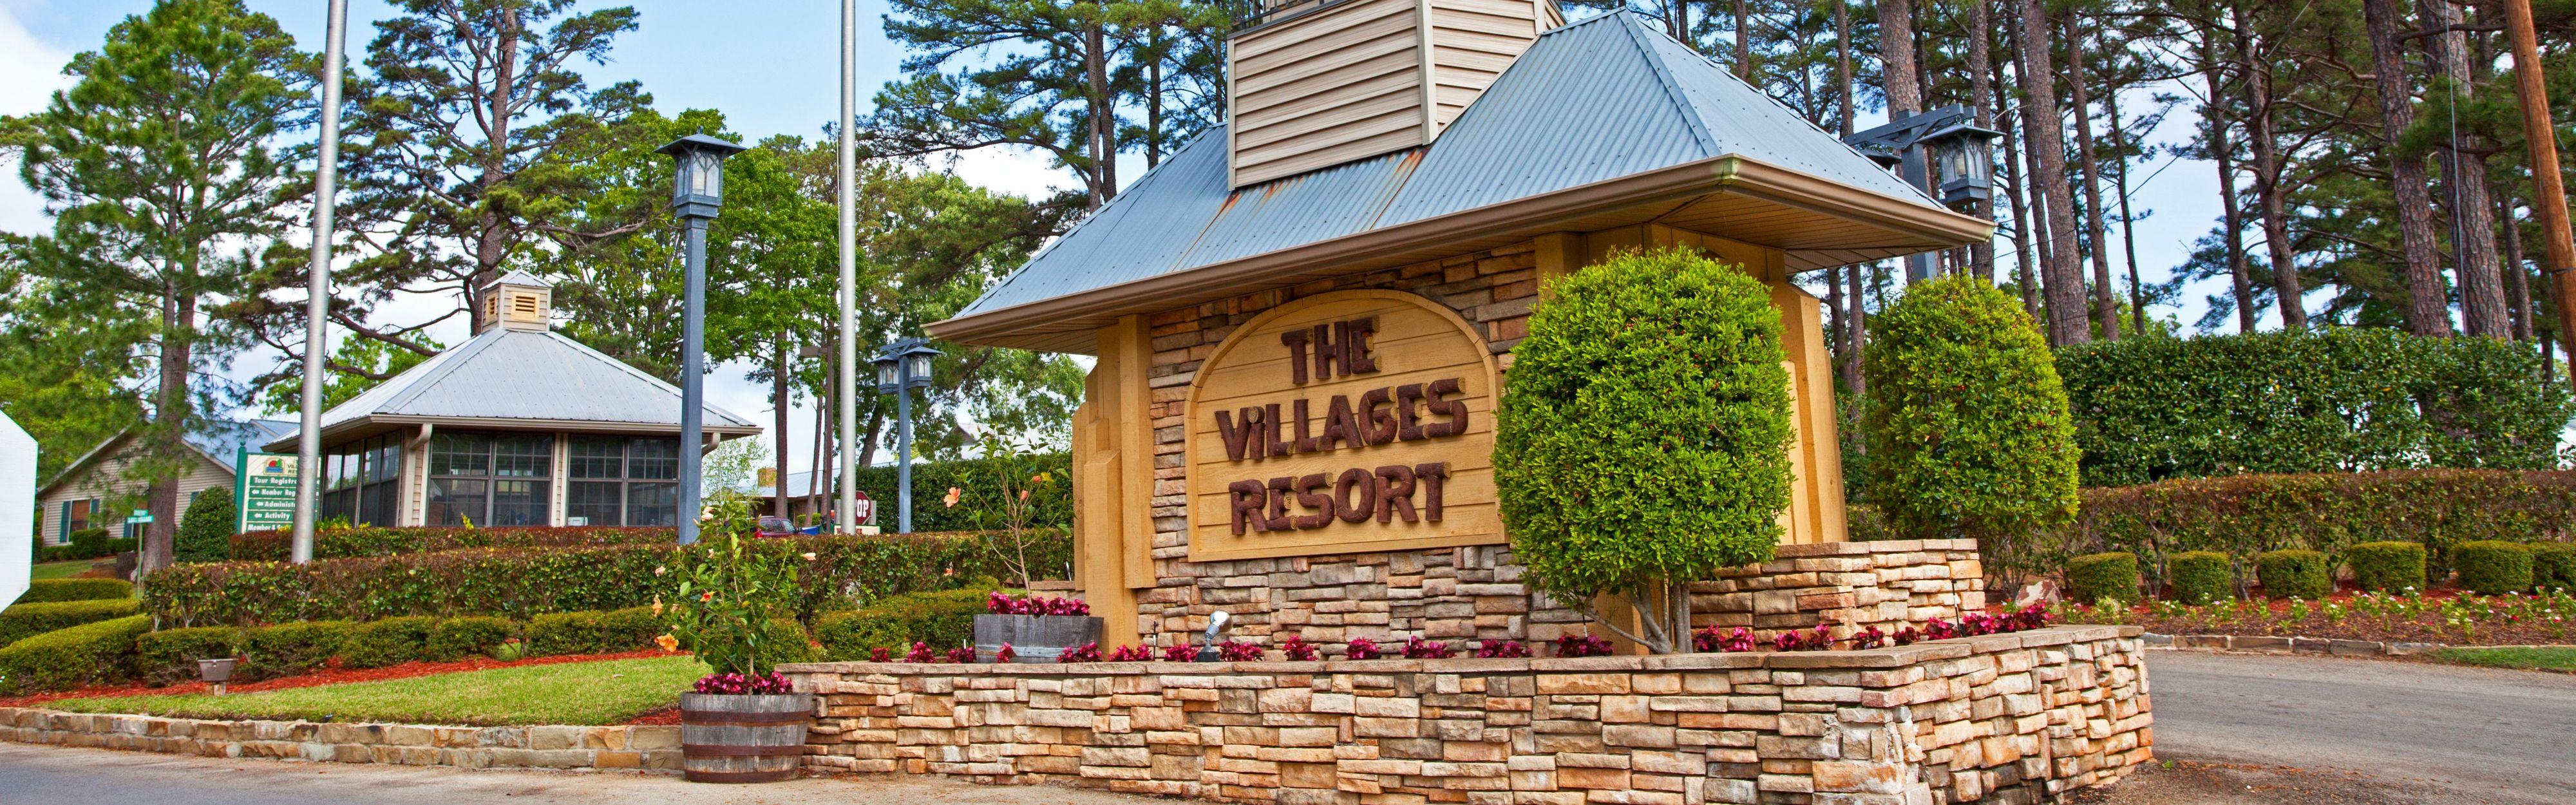 Holiday Inn Club Vacations Villages Resort image 0